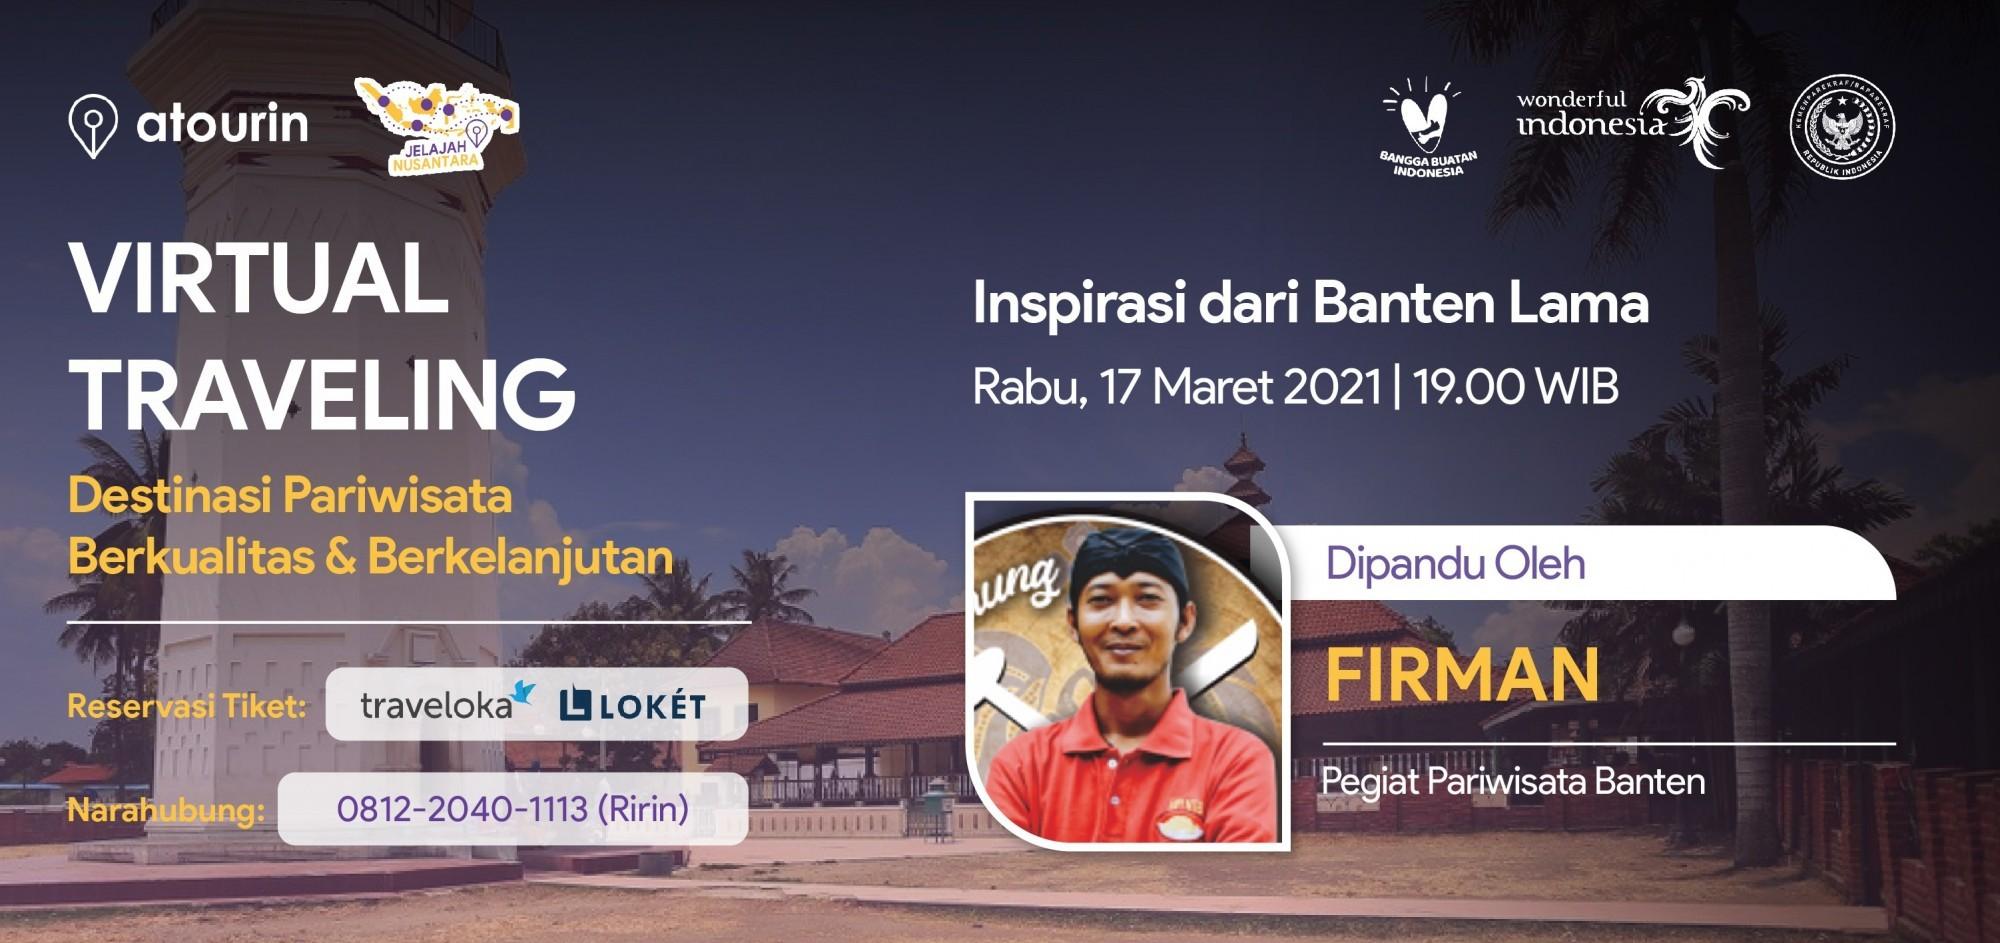 Inspirasi dari Banten Lama